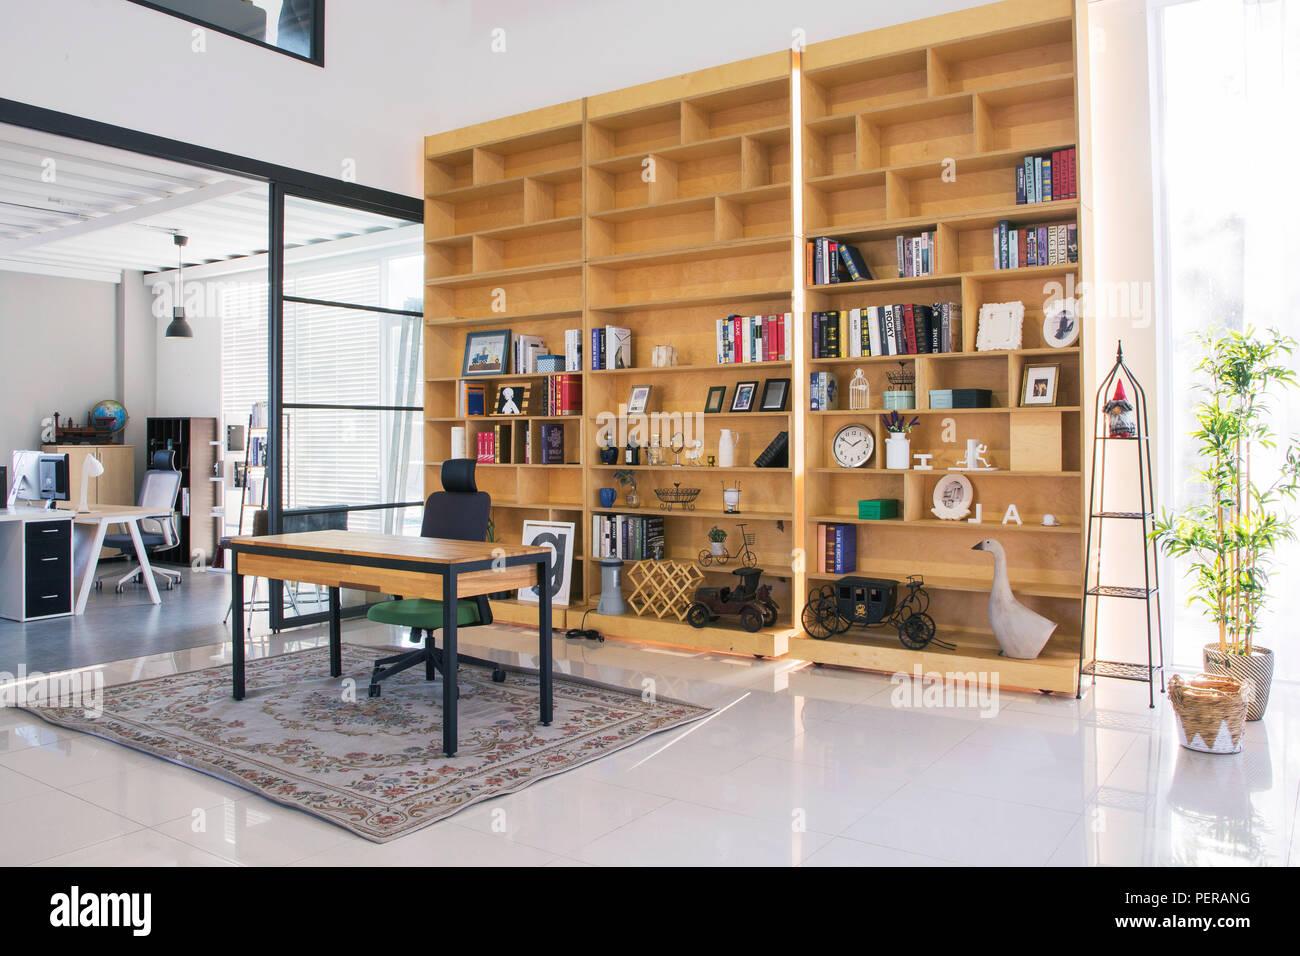 Modern Space Interiors Design Stock Photo Living Room Office Room